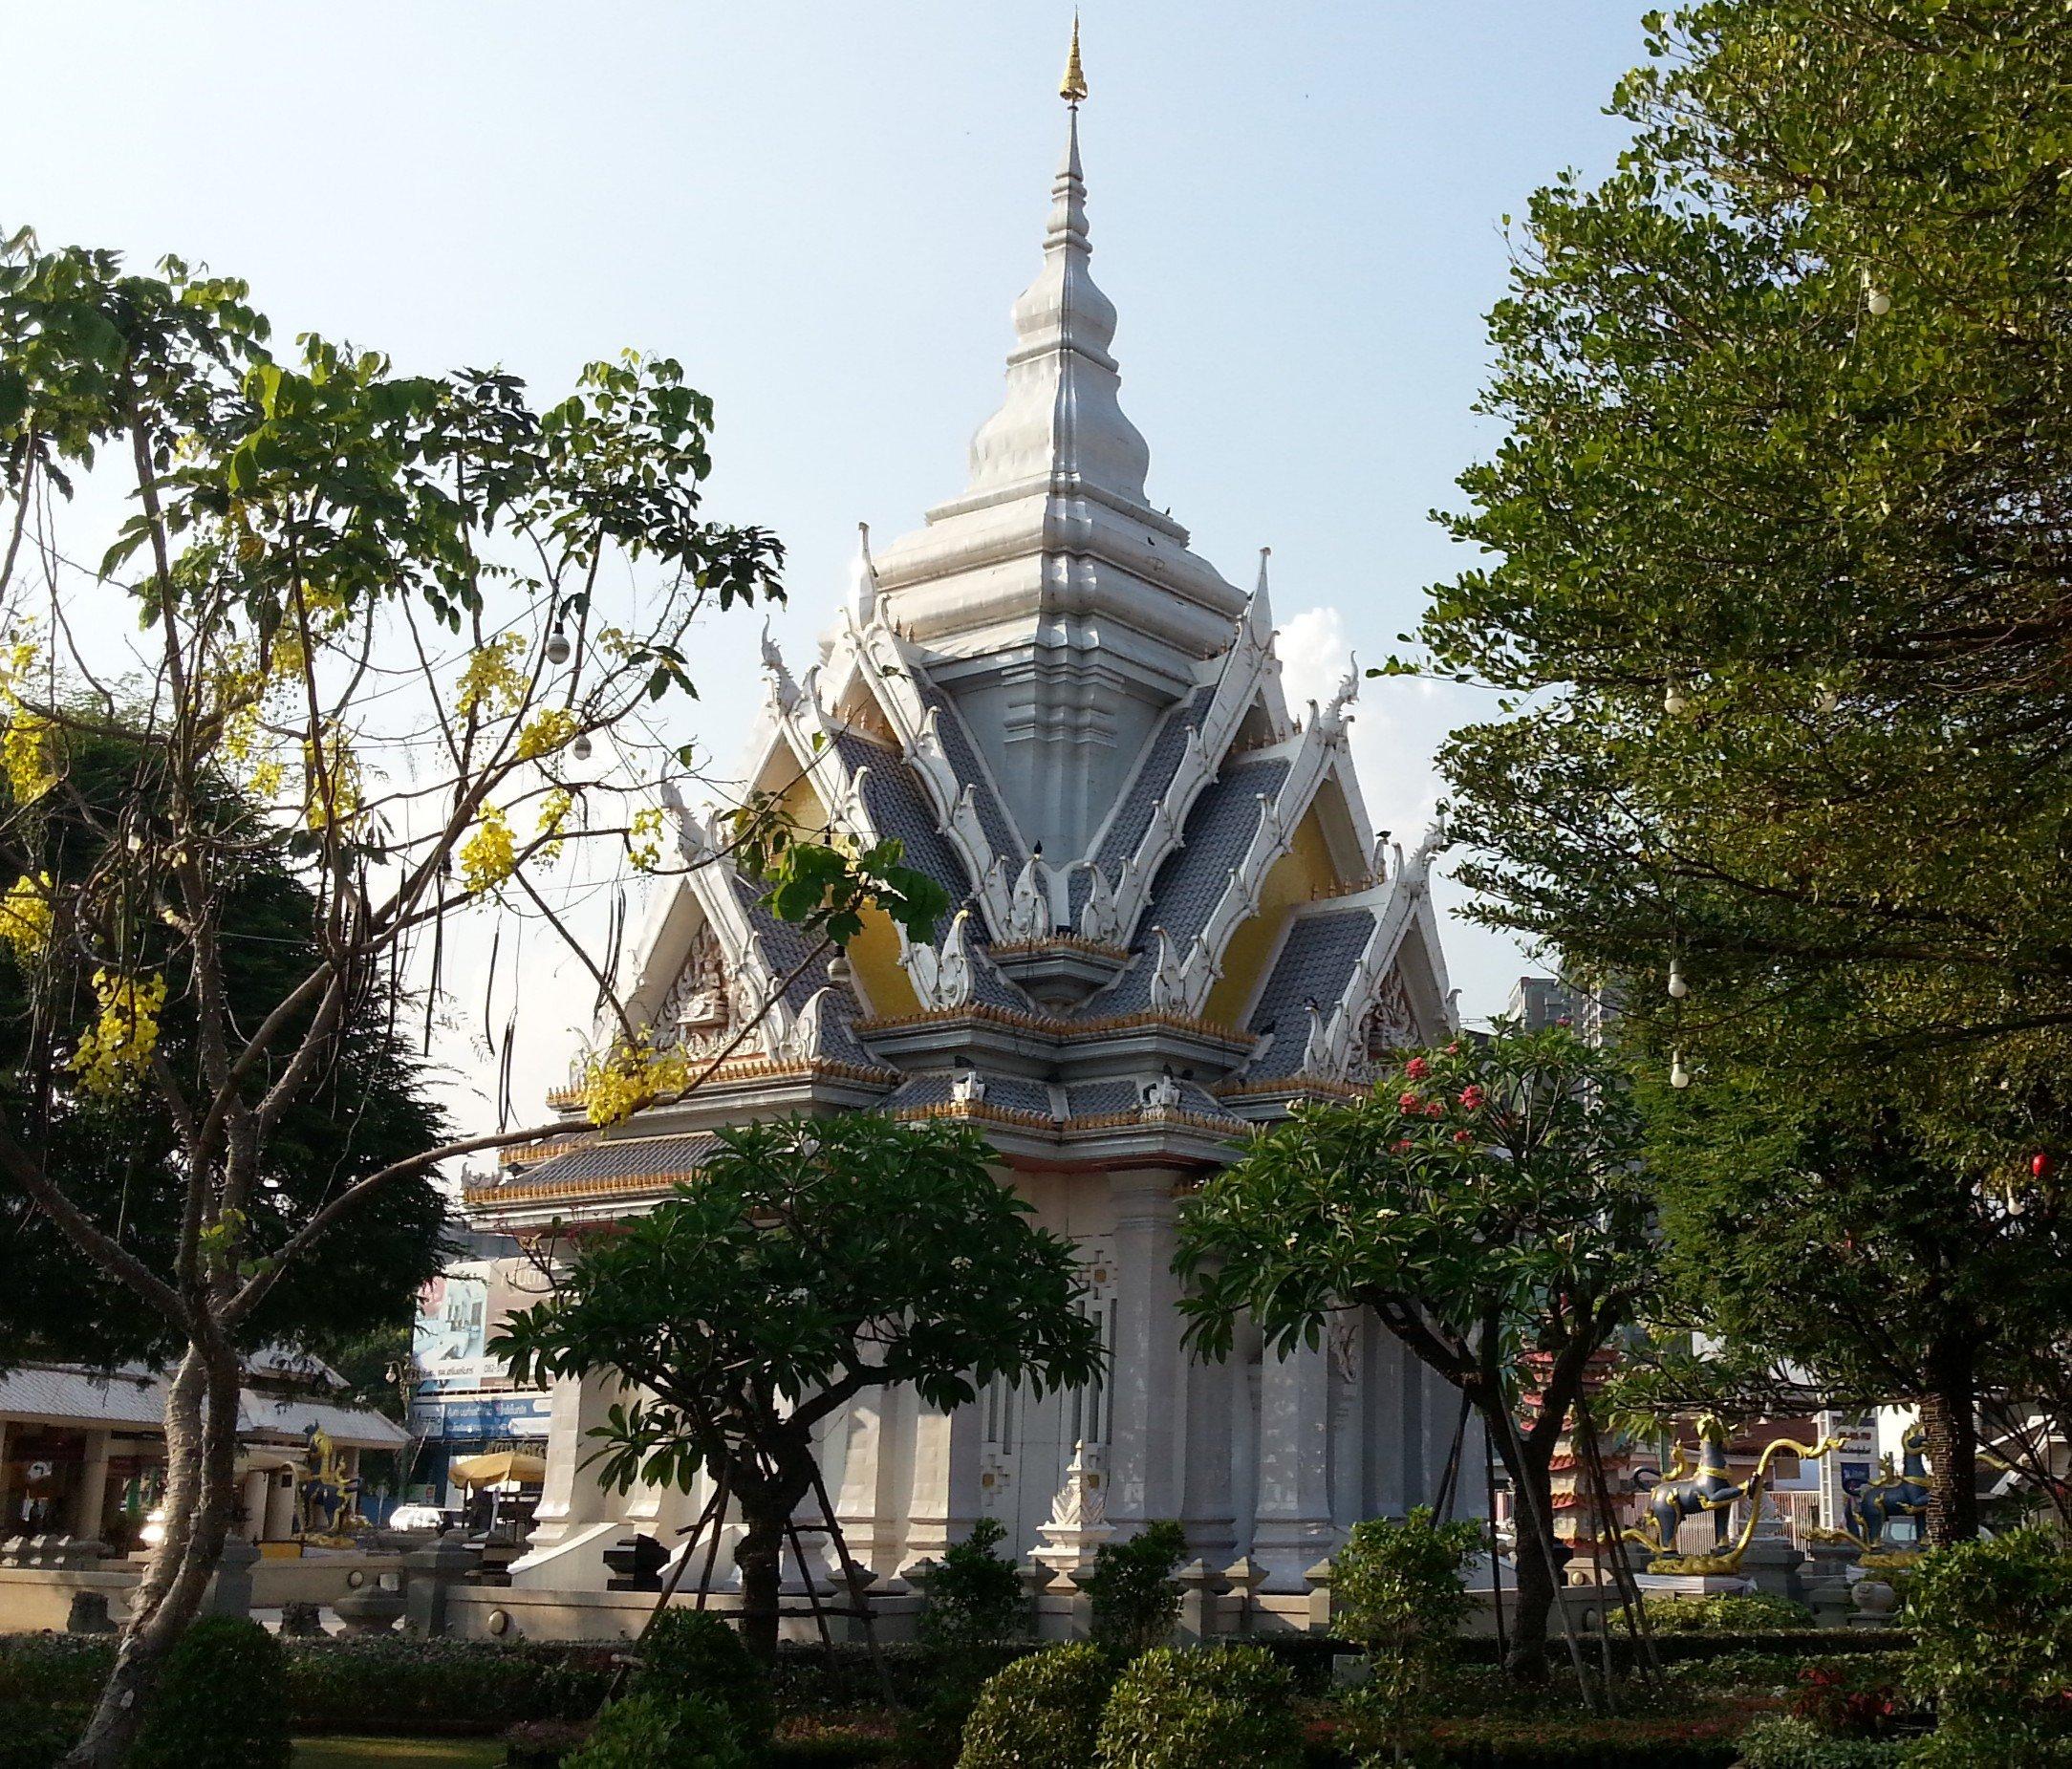 Chao Por Lak Muang Shrine in Khon Kaen